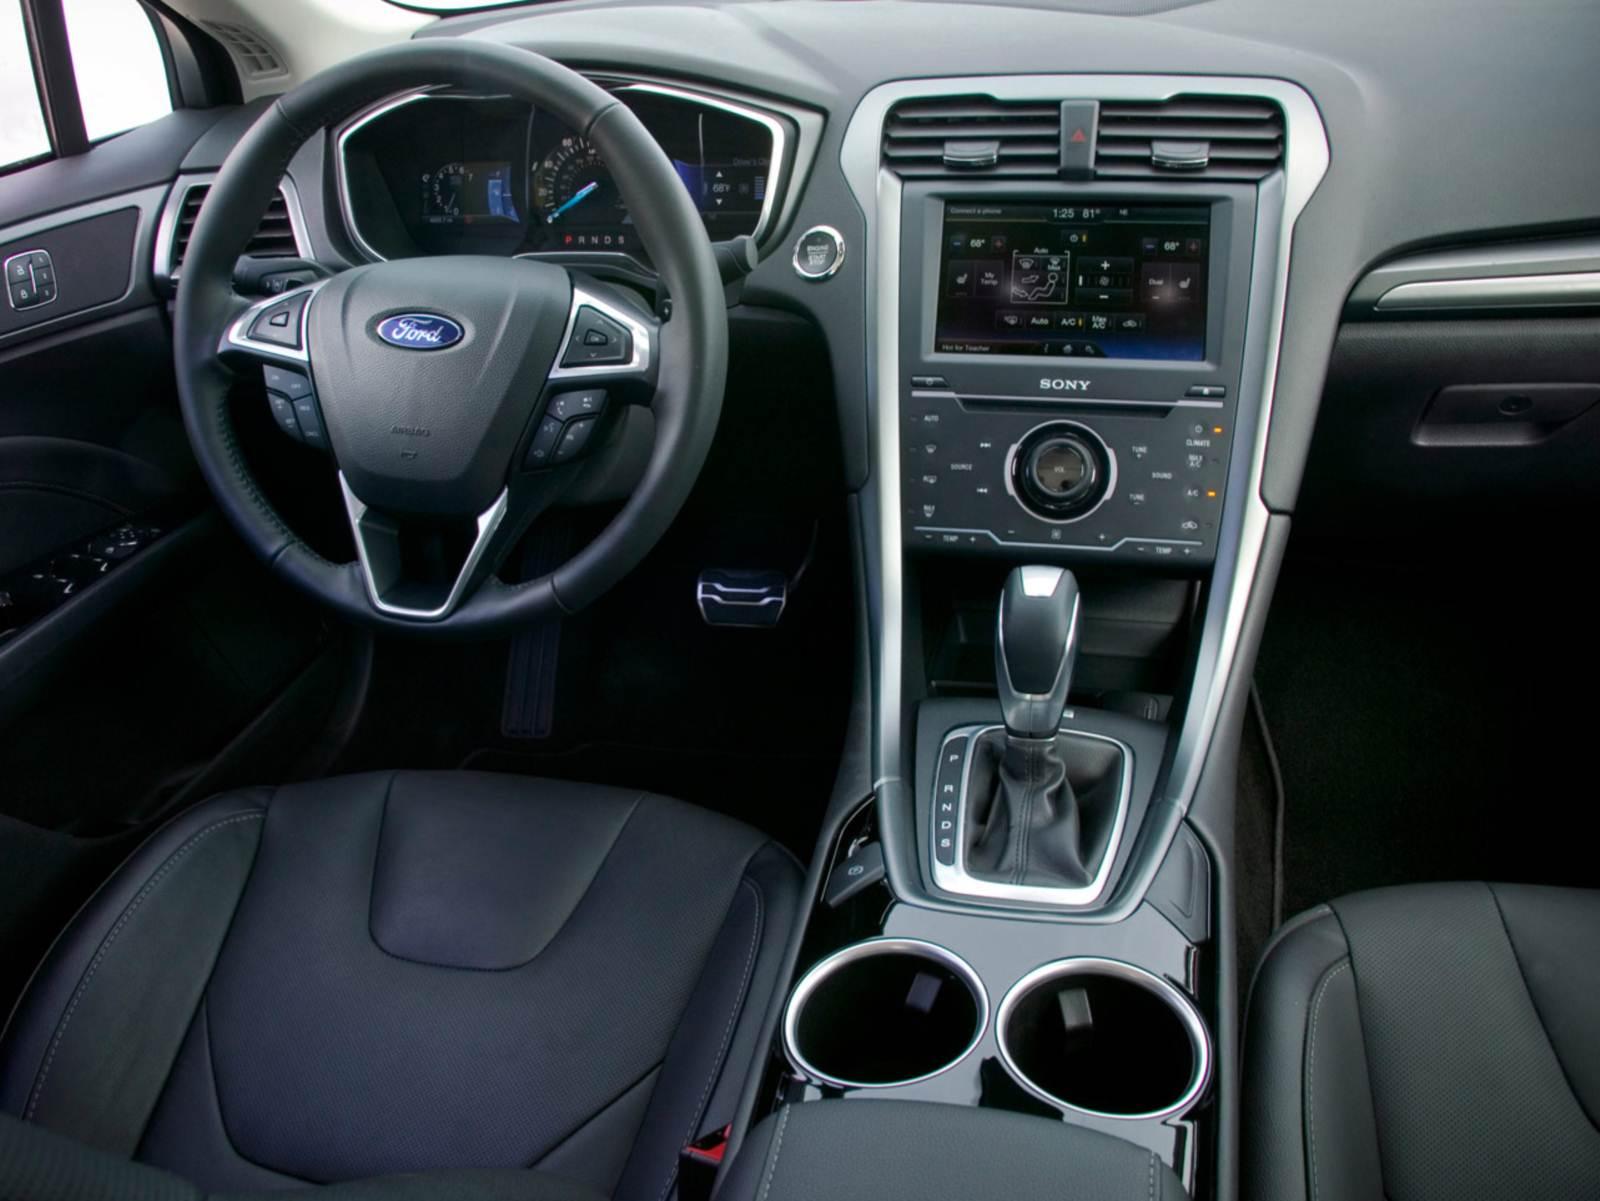 Ford Fusion 2013 Fotos Pre 231 O Consumo E Especifica 231 245 Es